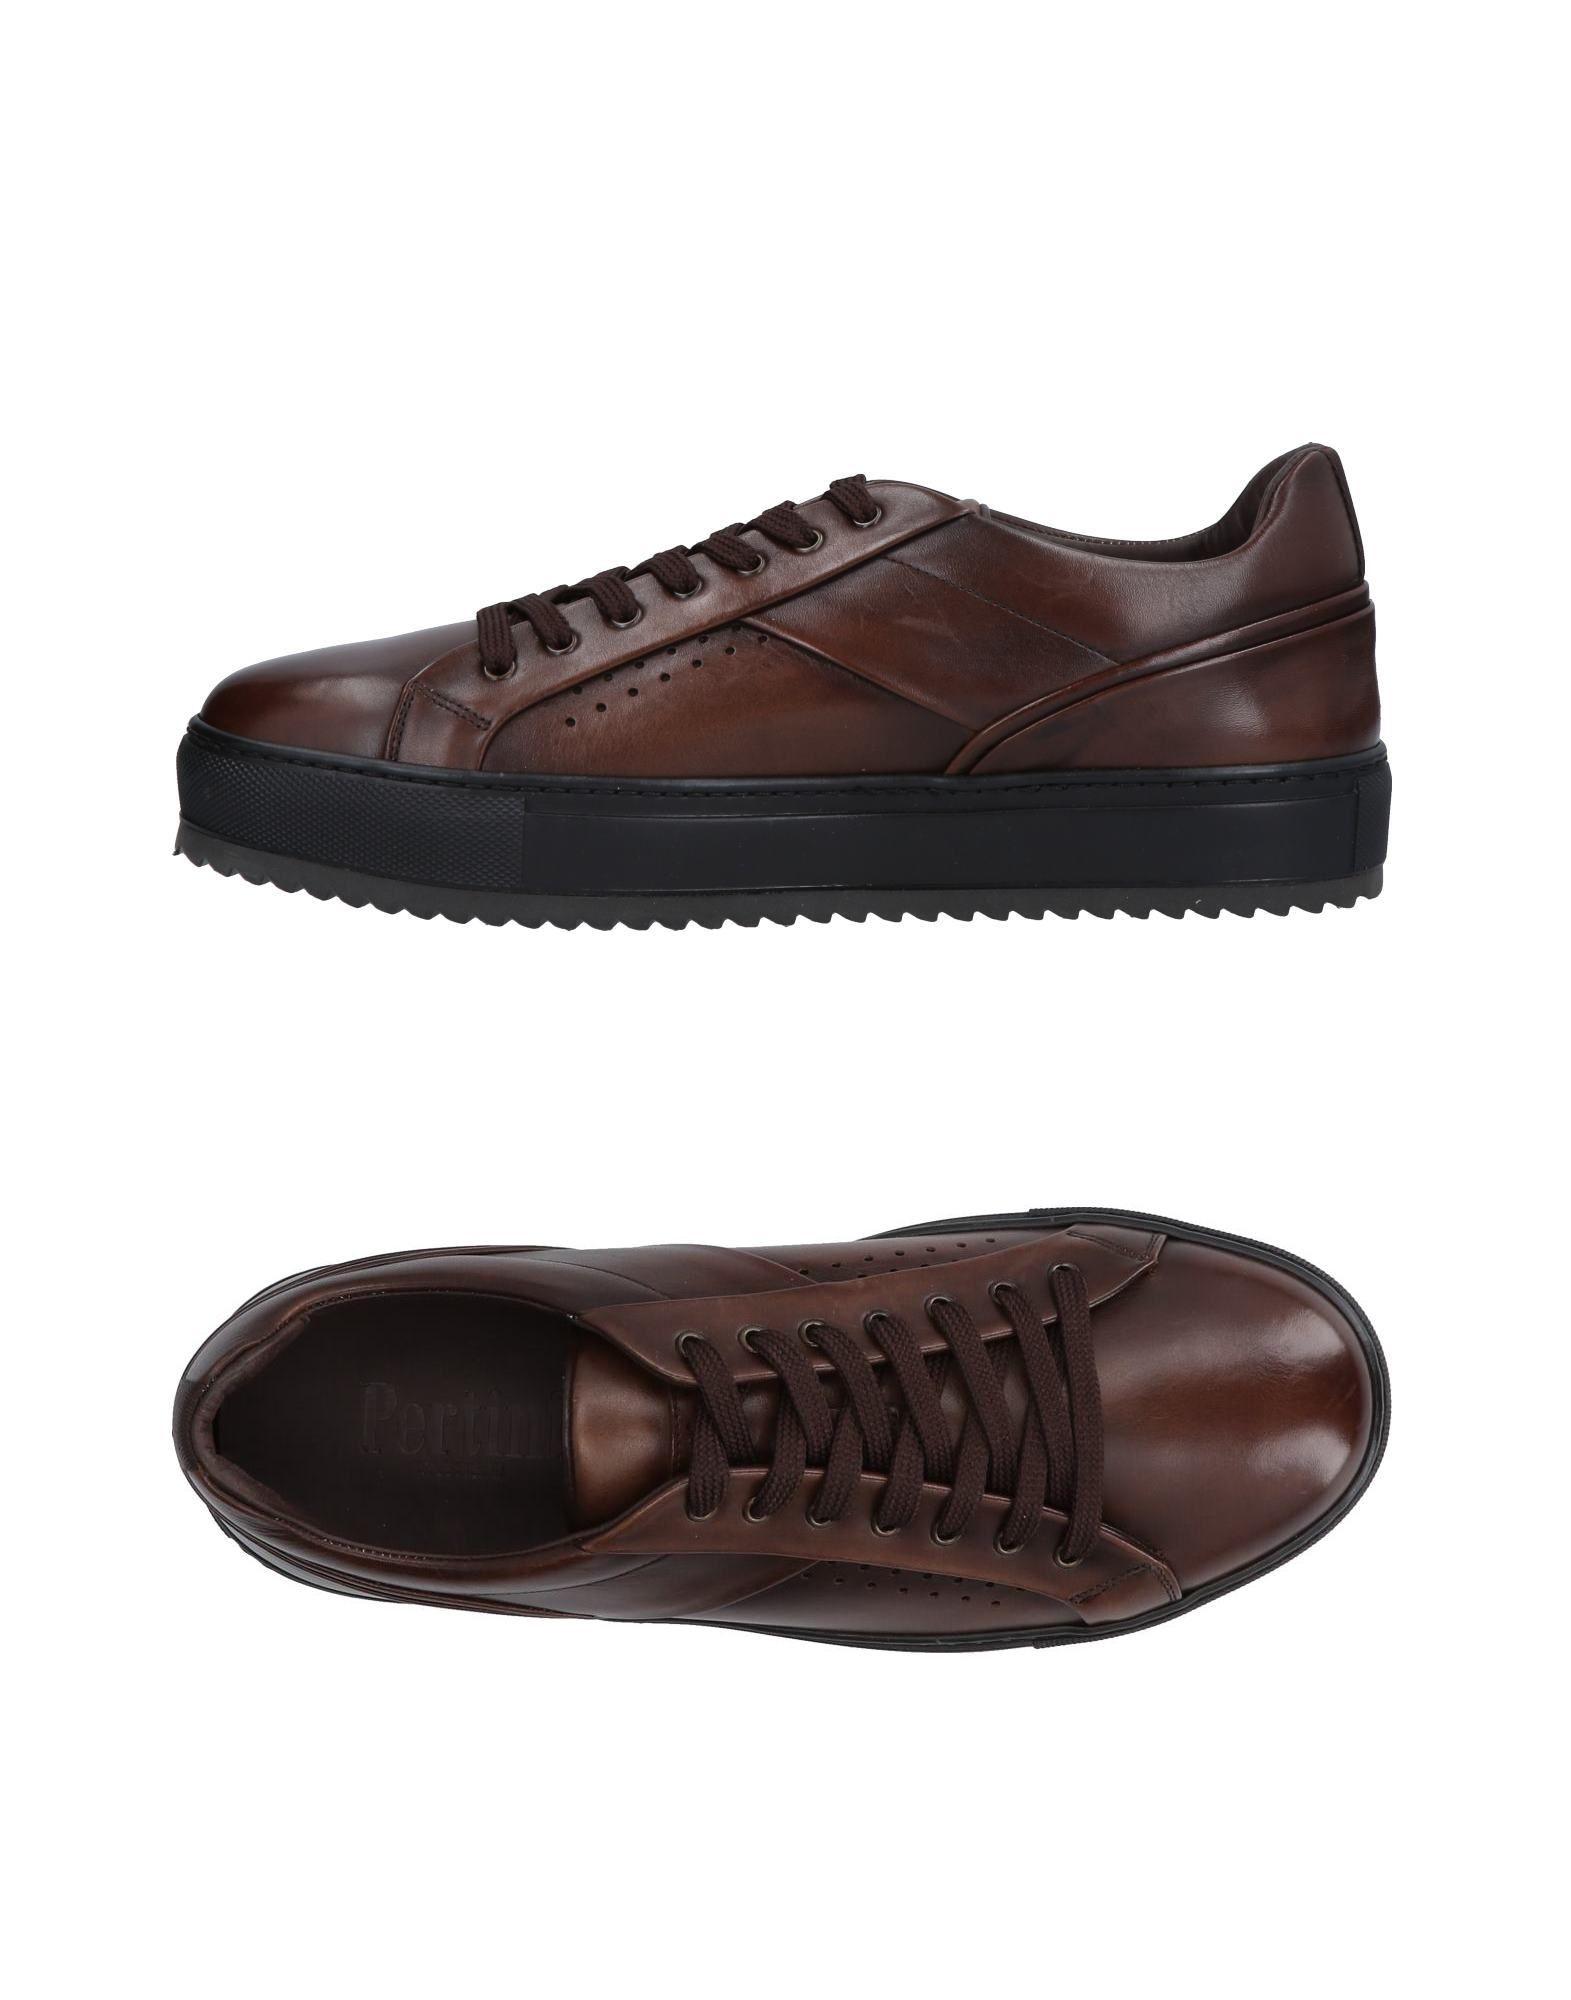 Rabatt echte  Schuhe Pertini Sneakers Herren  echte 11486253RN 592fac